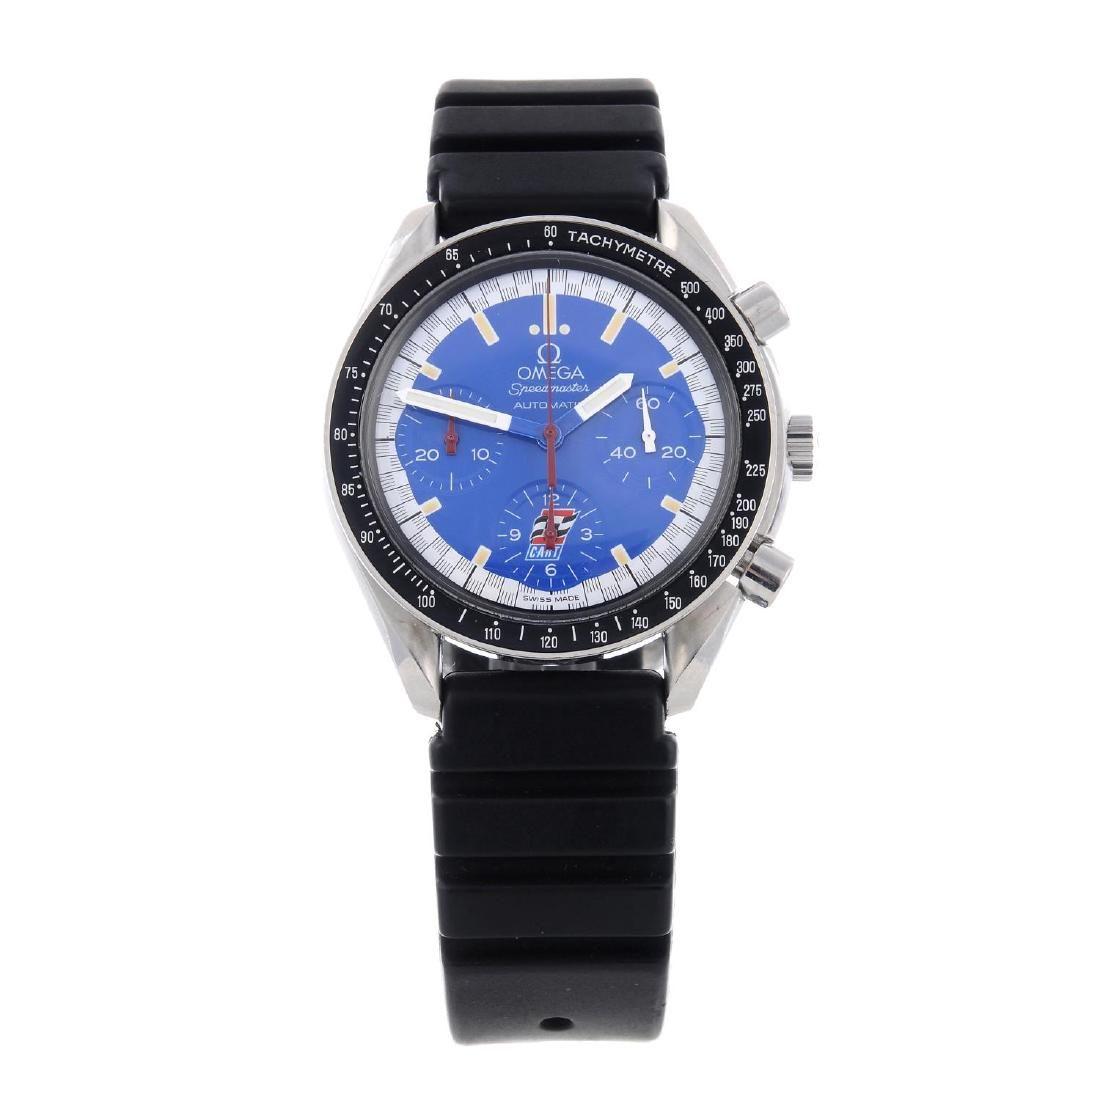 OMEGA - a gentleman's Speedmaster 'CART' chronograph